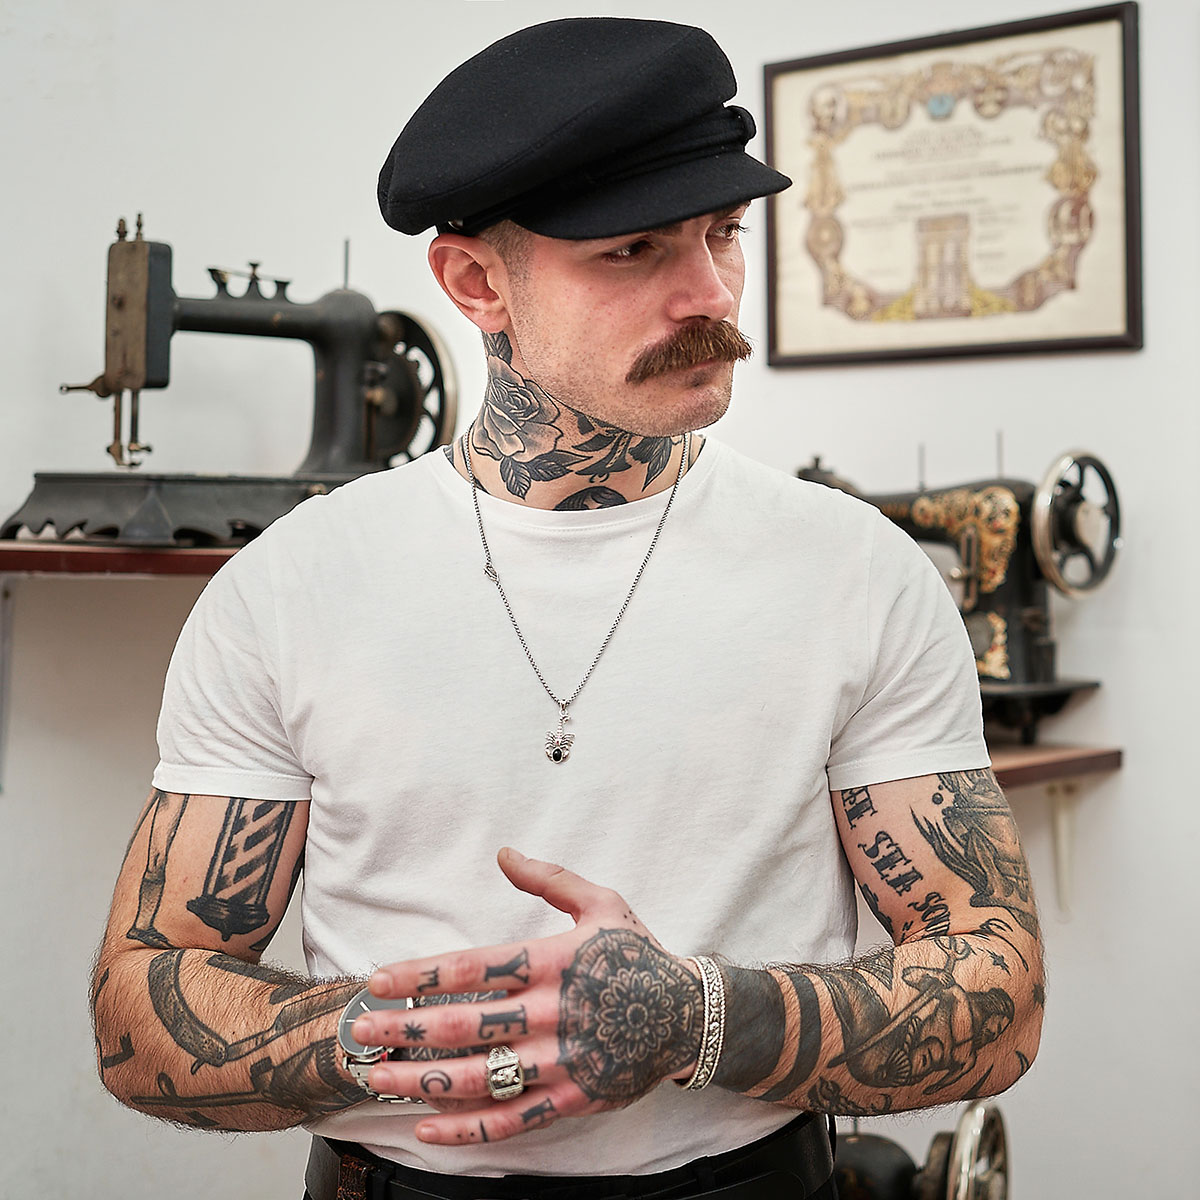 Wool cloth traditional Polish peaked cap fiddler breton greek fisherman cabman taxi driver chimney-sweep railway man hat